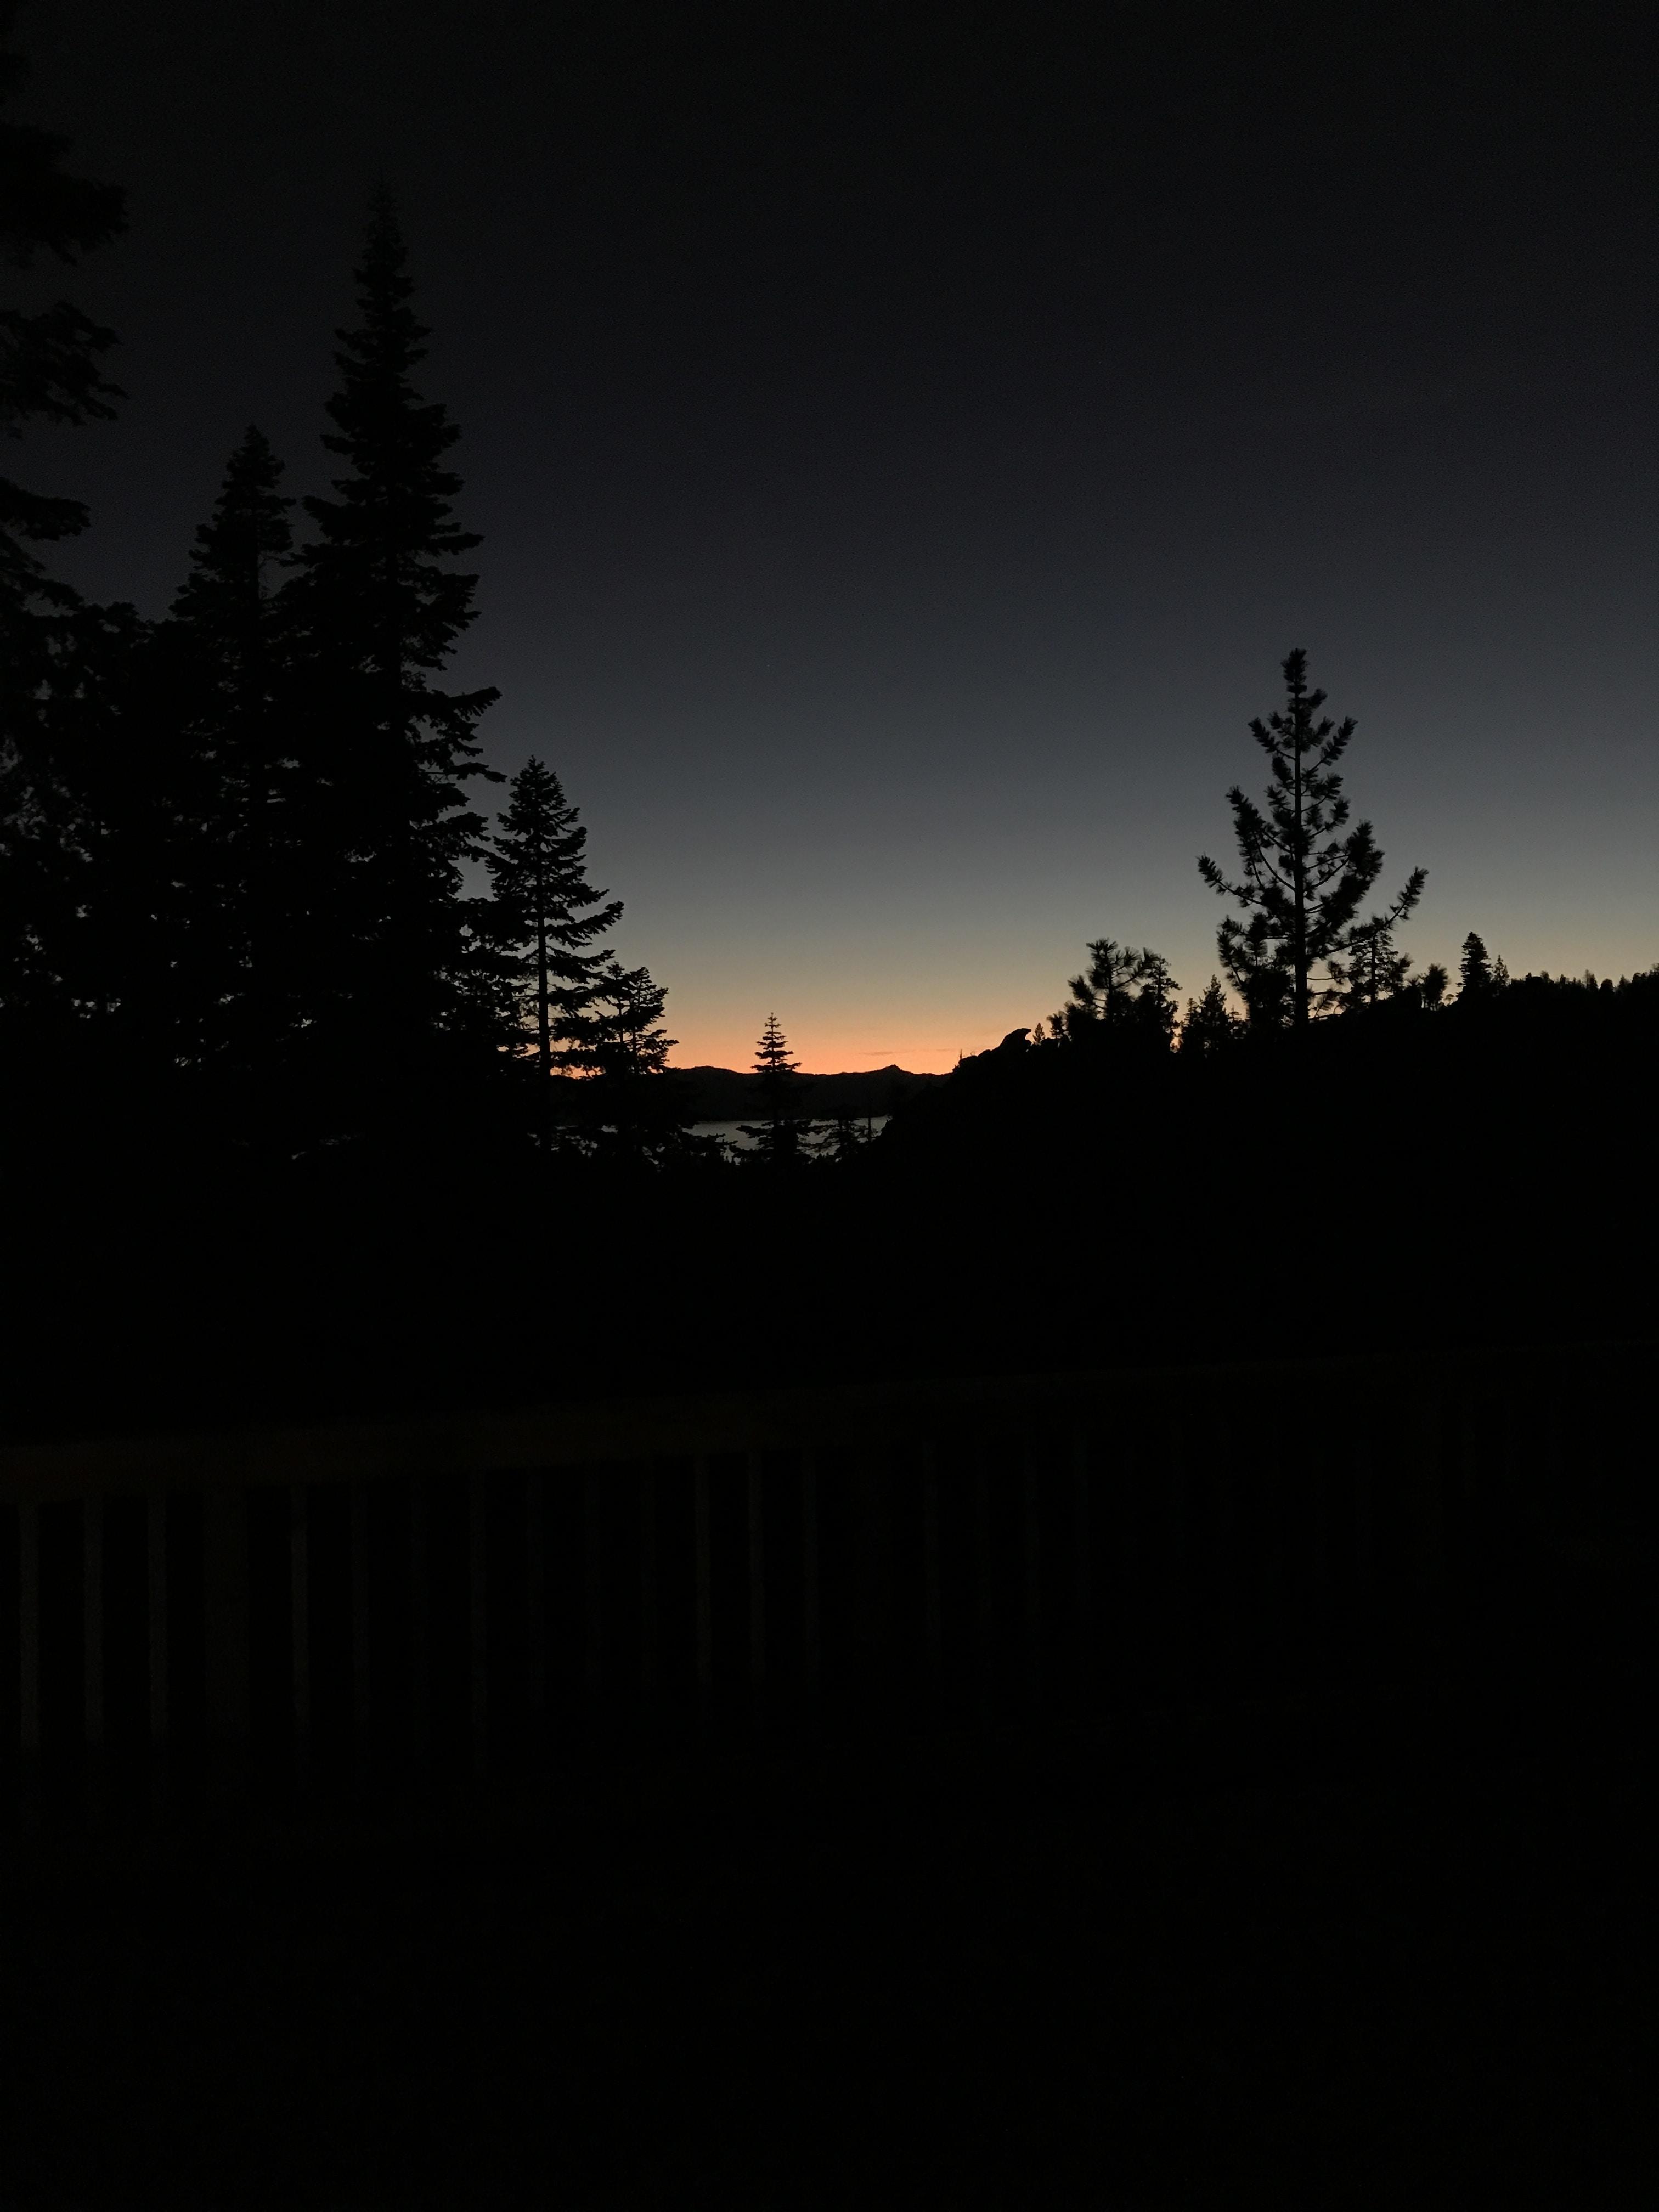 A silhouette of a treeline against a twilight sky